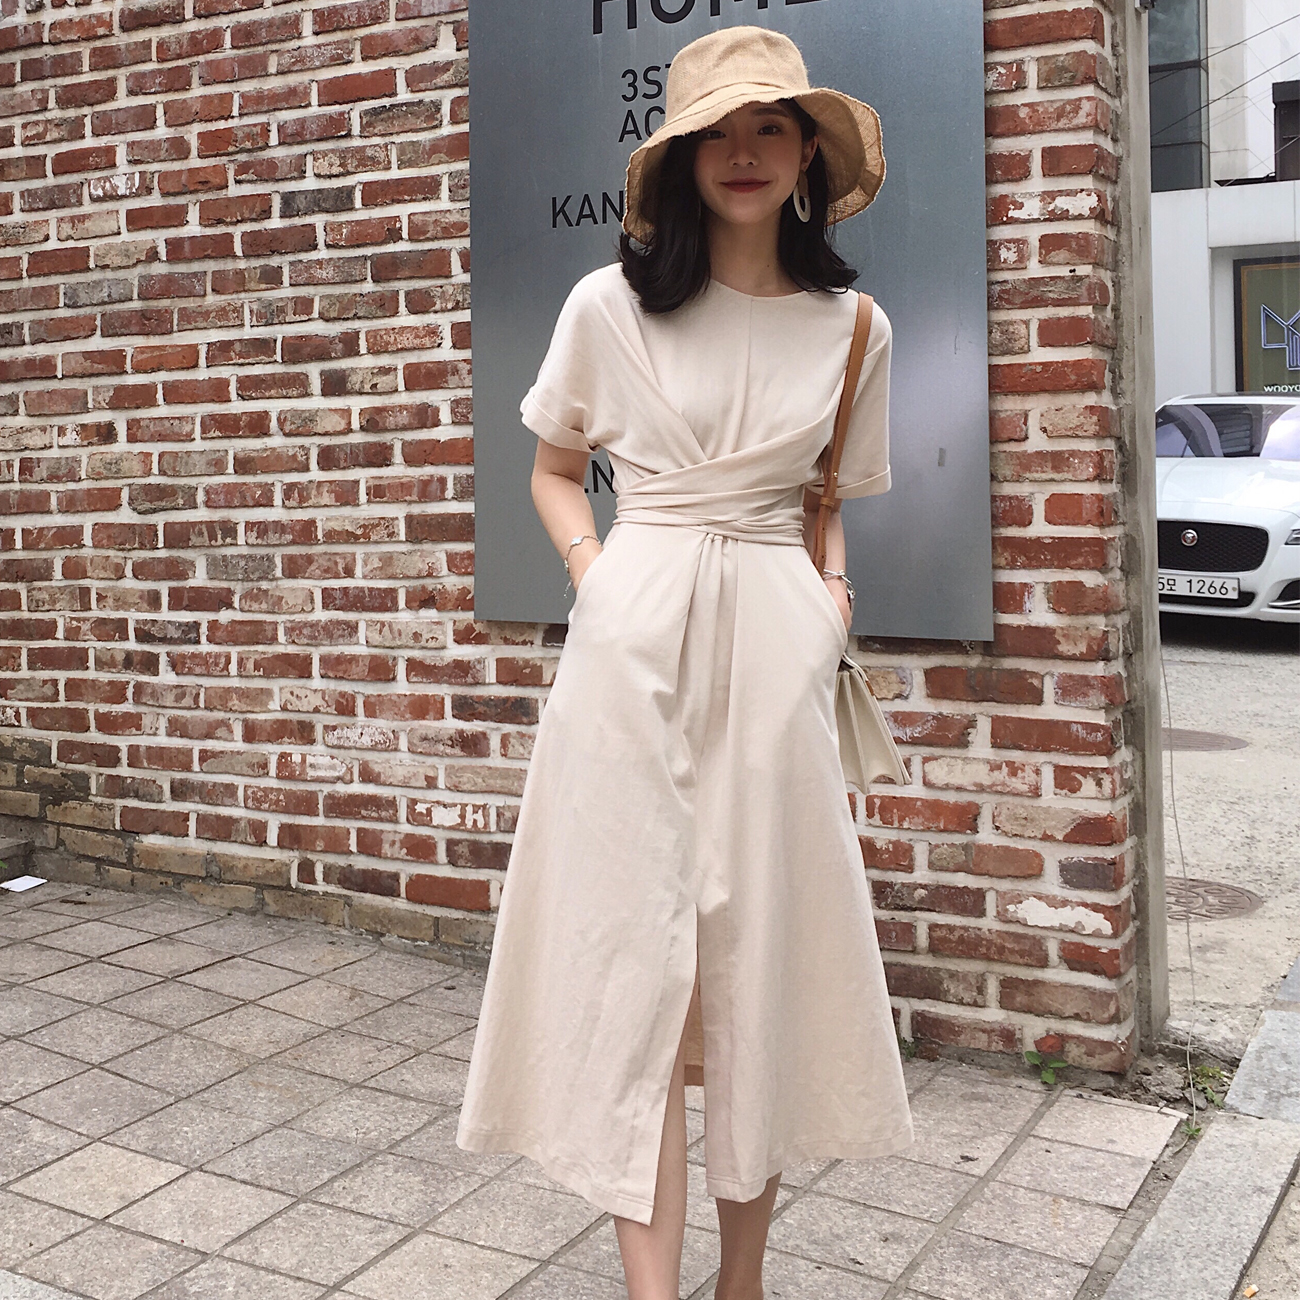 ◆ASM◆2018夏季新款短袖高腰收腰裙子气质显瘦中长款连衣裙女装